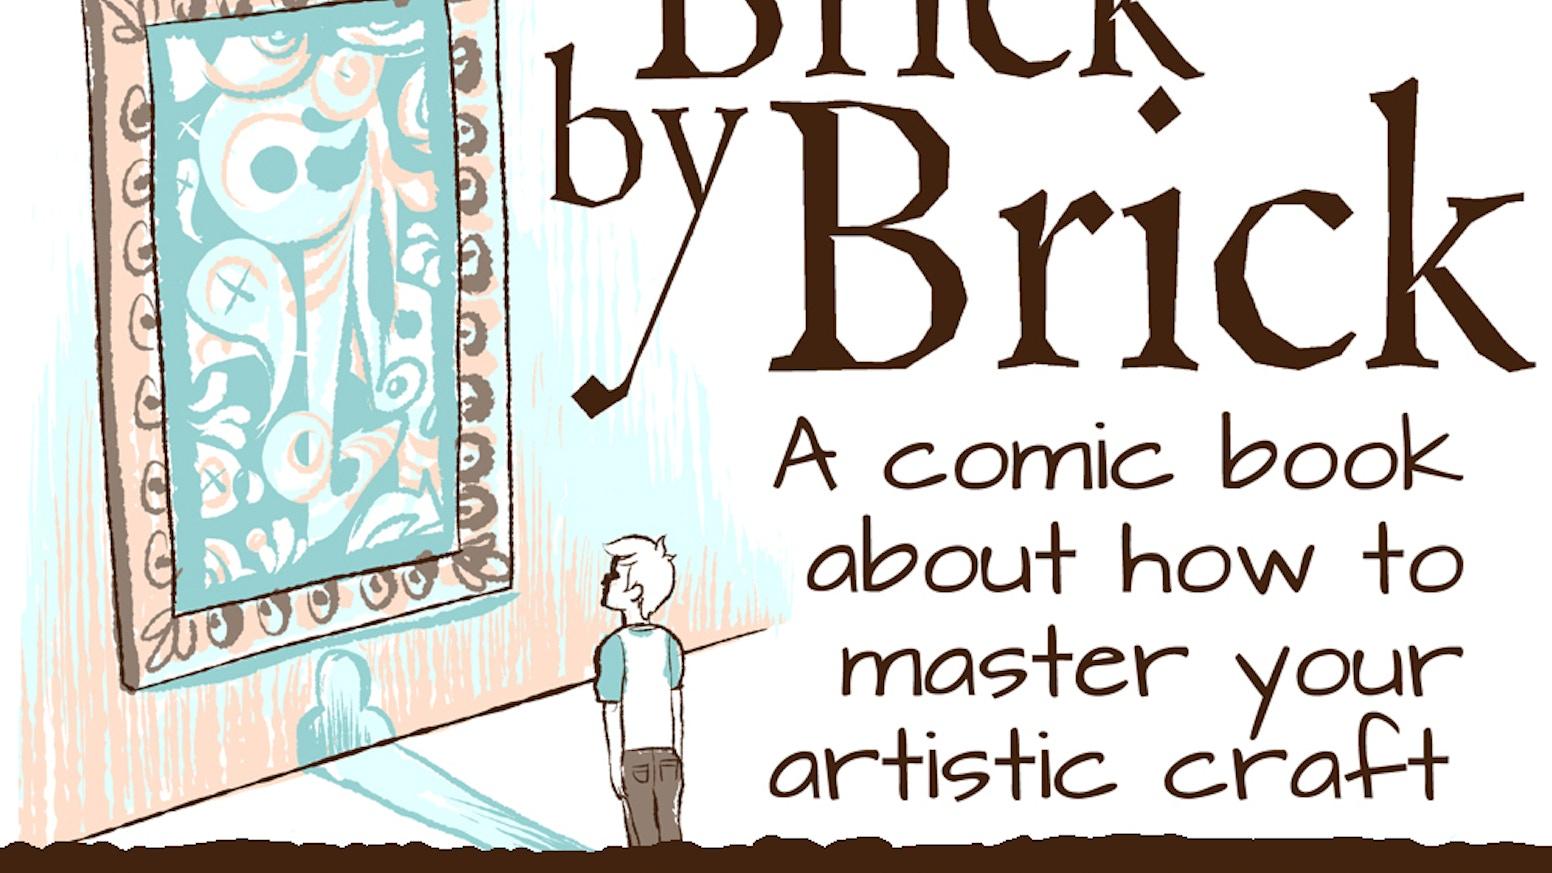 Brick by Brick by Stephen McCranie » Final PDF Book Available